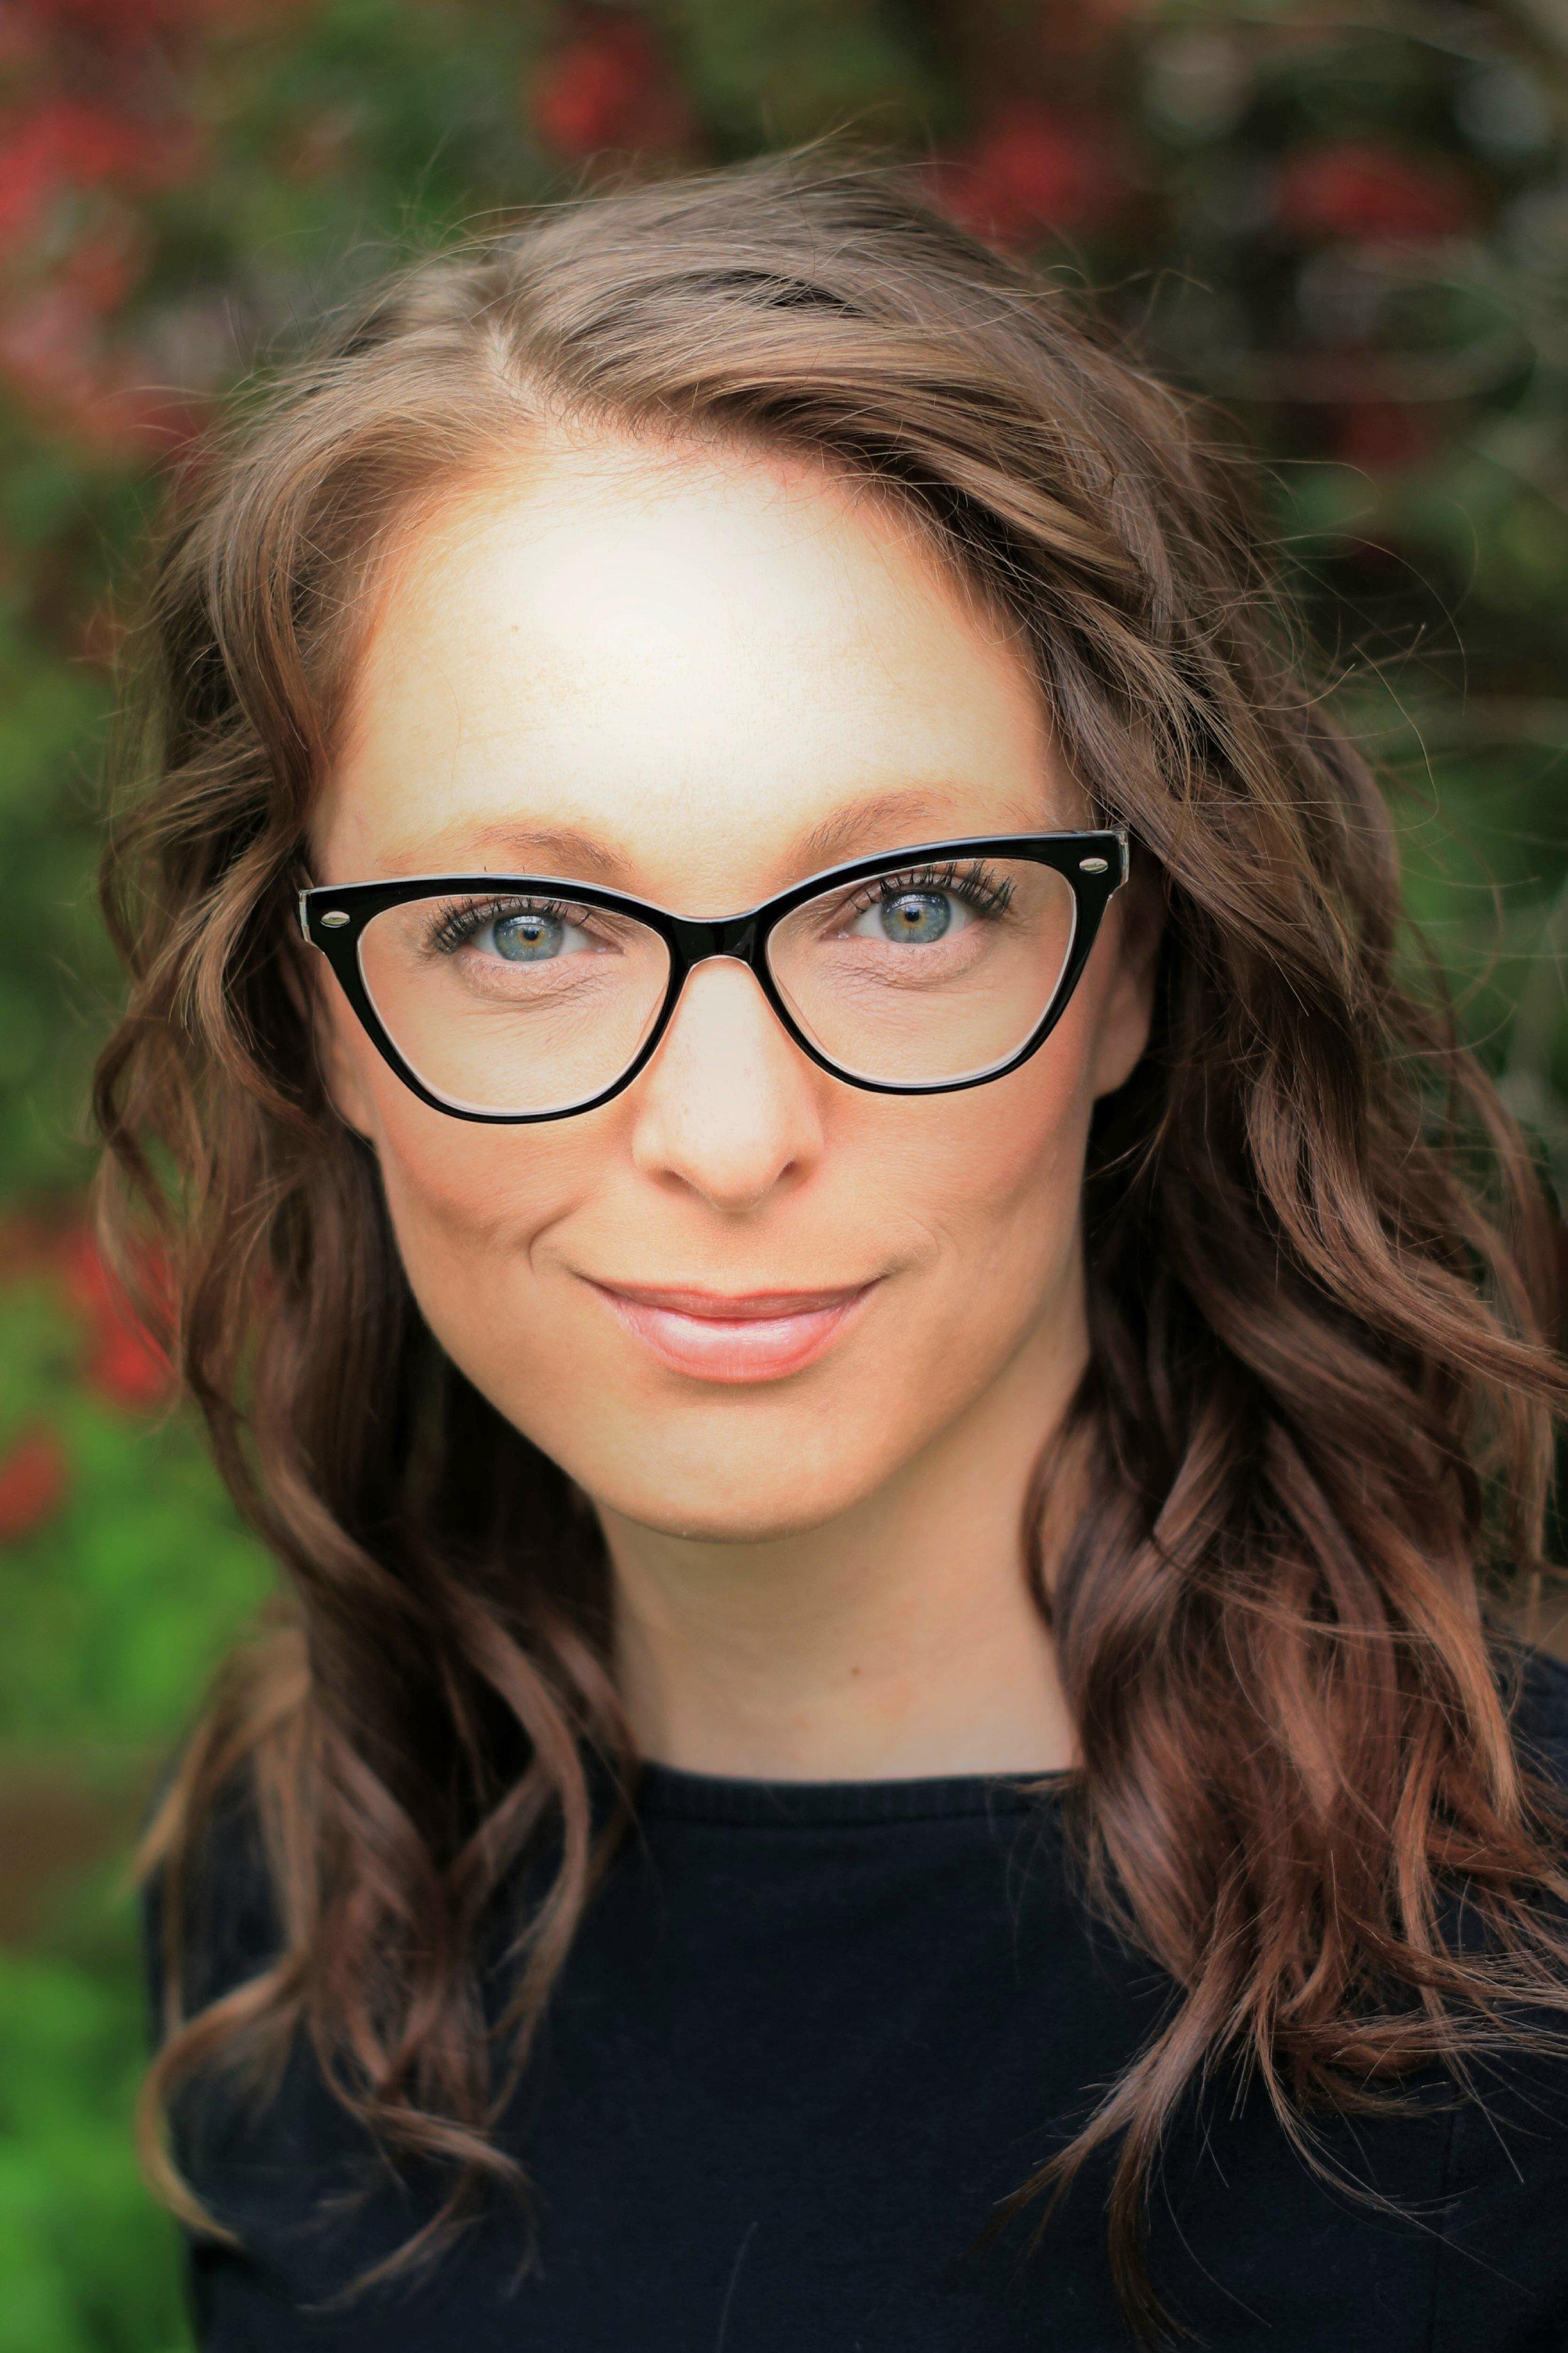 Marion Sprague, MYBC's newest Co-Coordinator